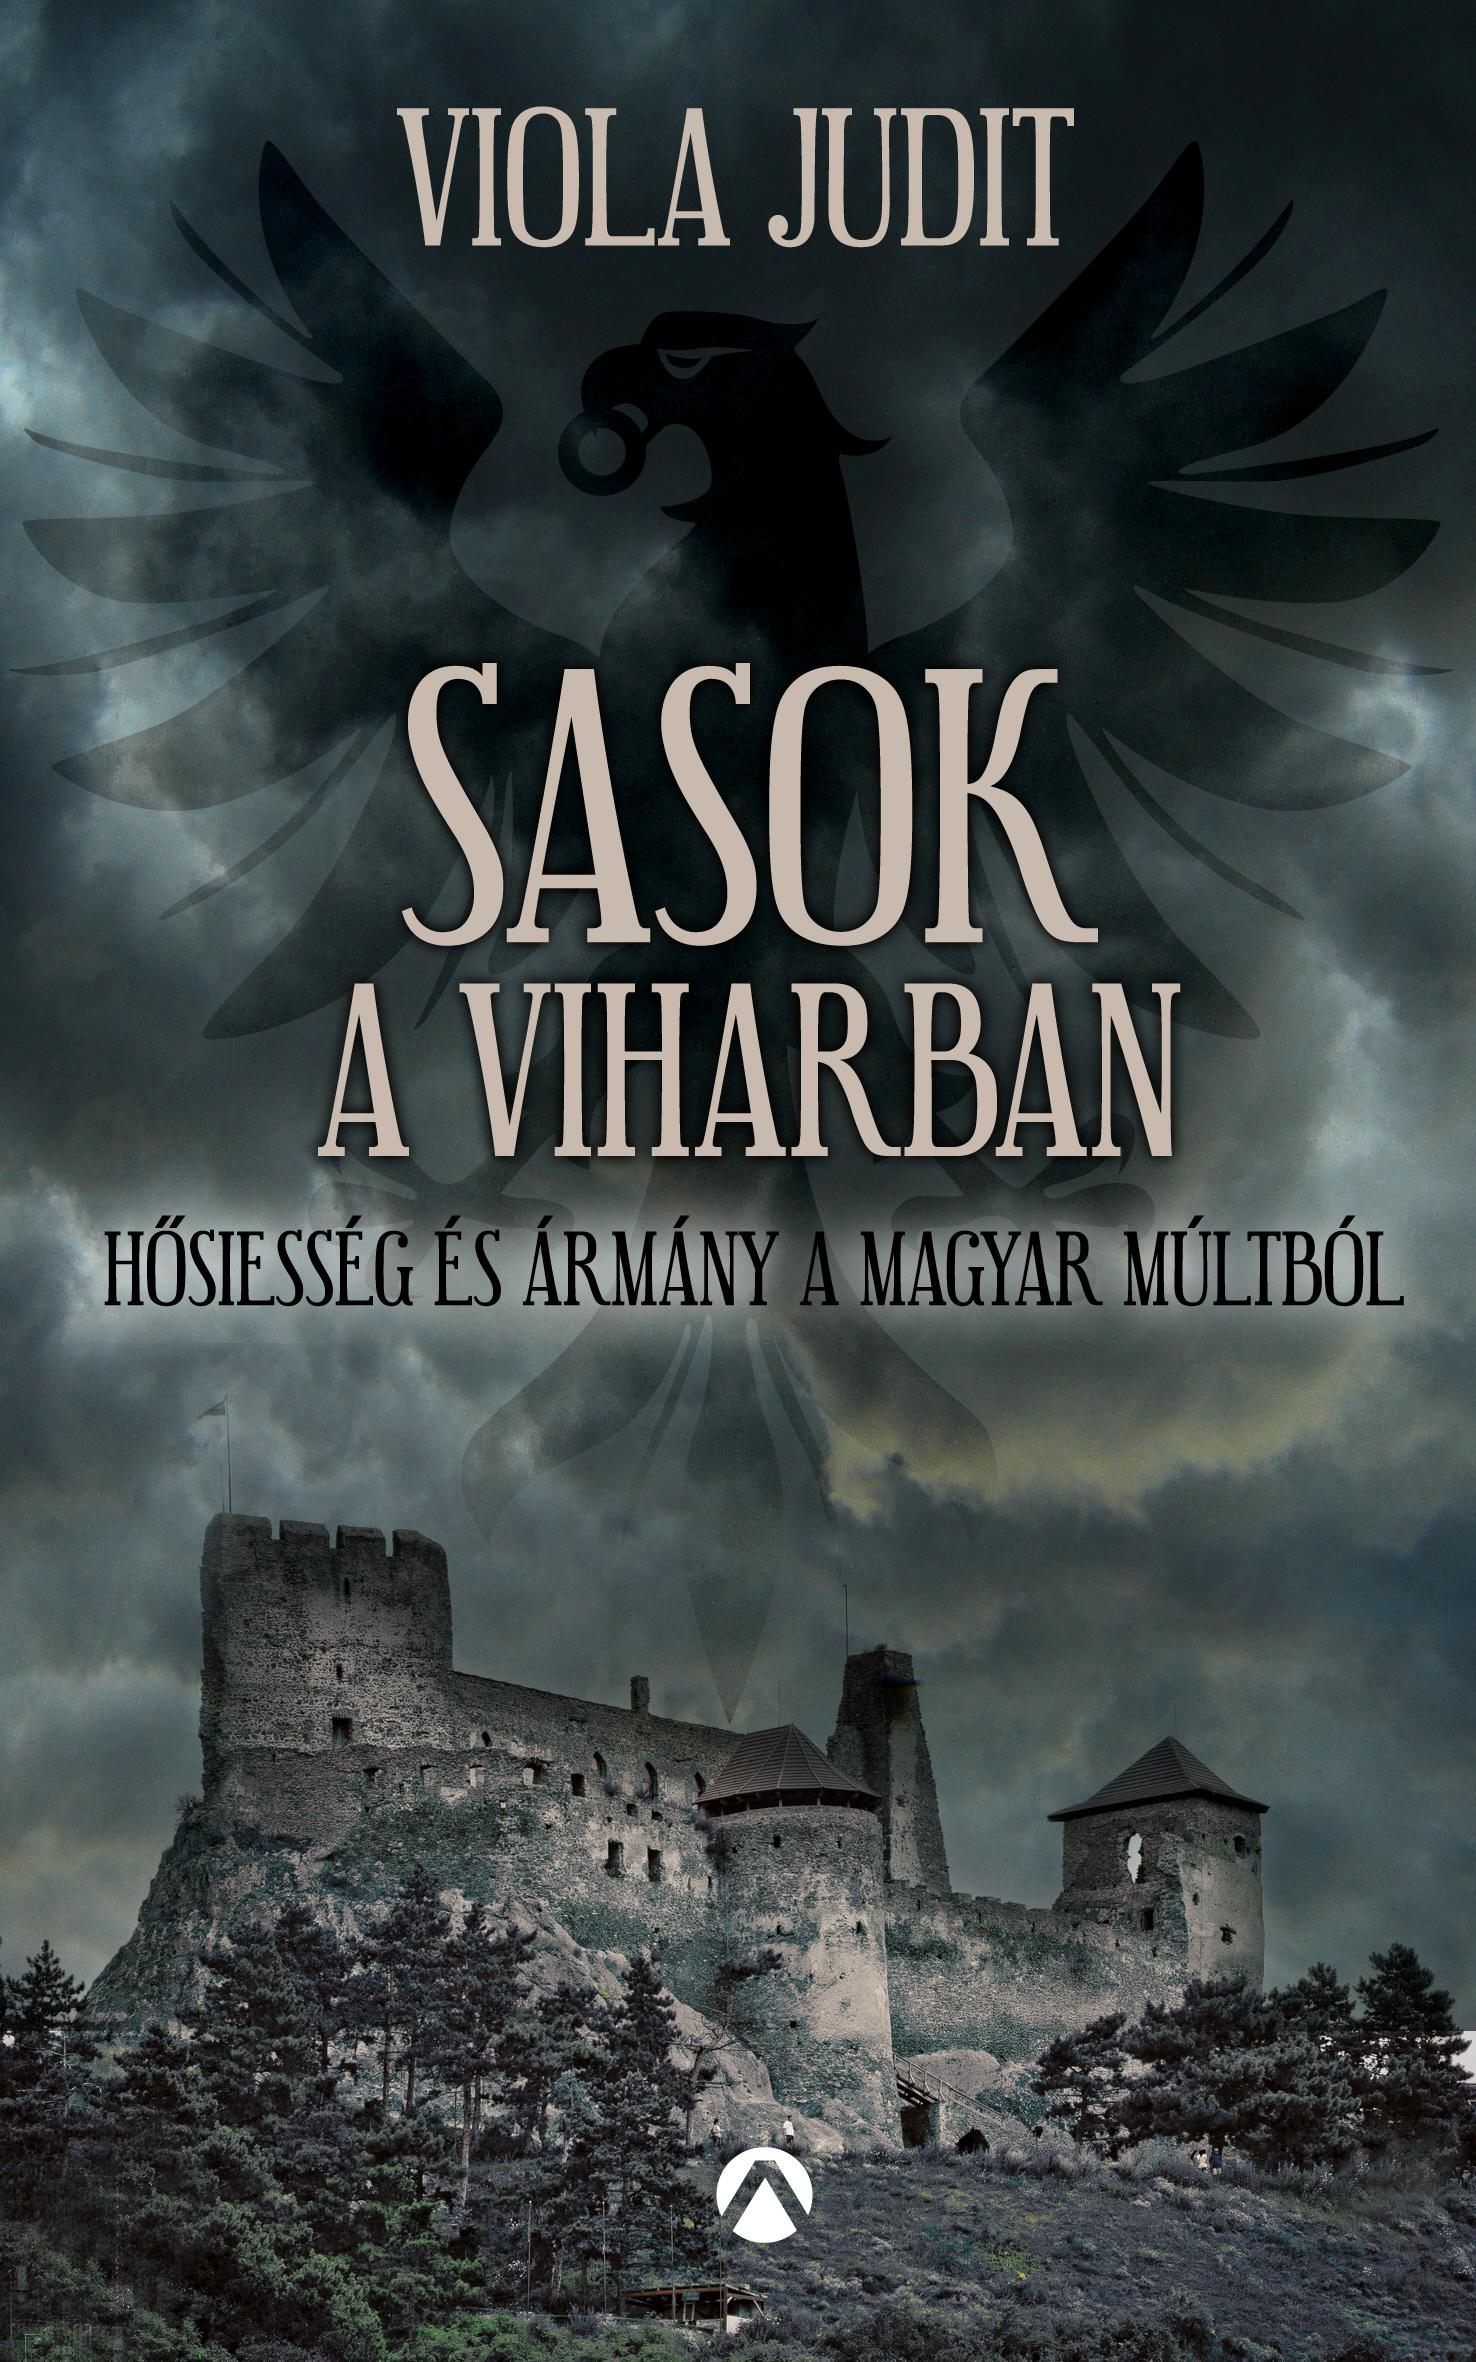 SASOK A VIHARBAN